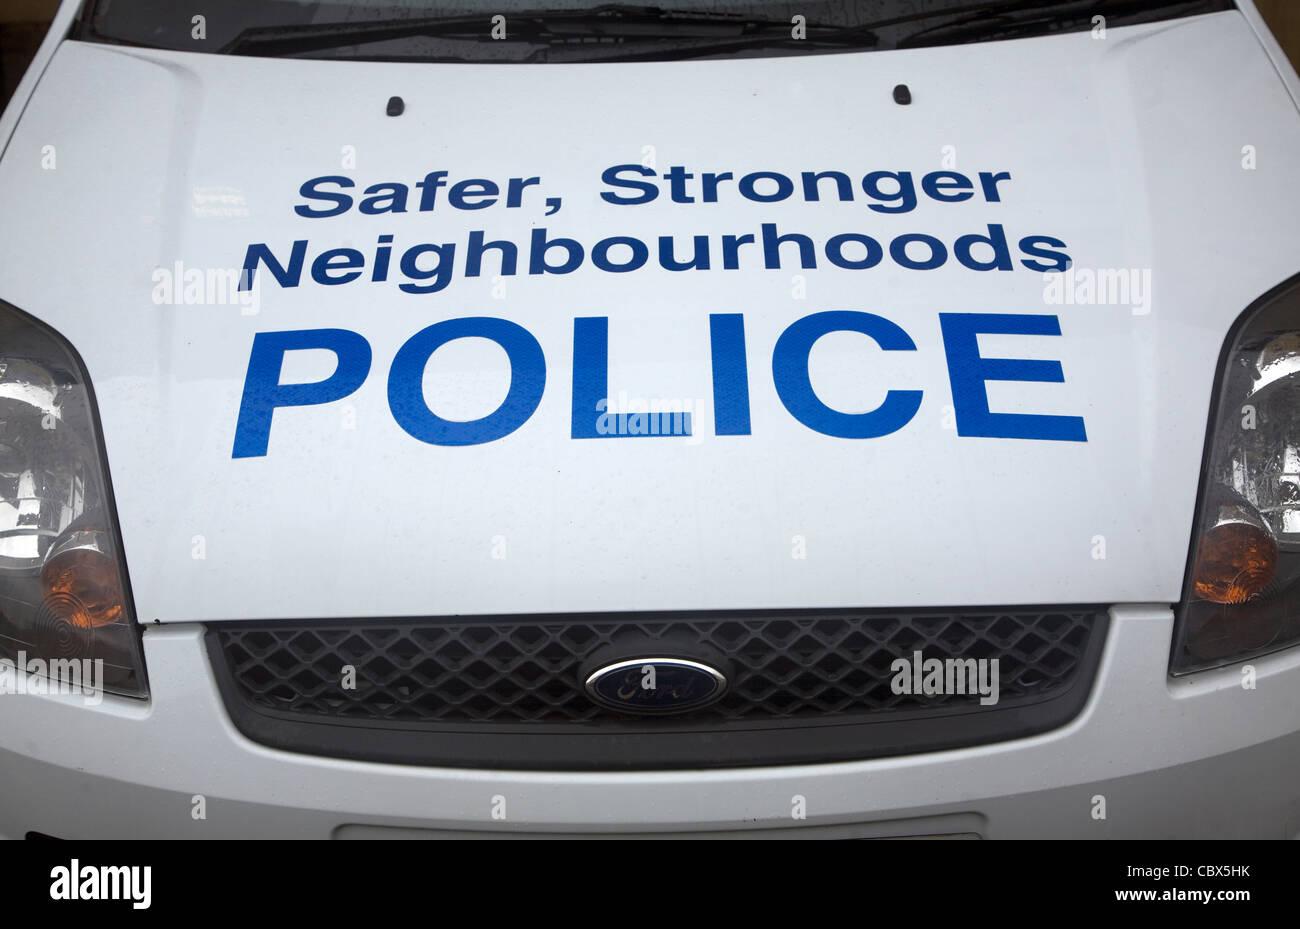 Safer, stronger neighbourhoods police car bonnet sign, Bath, England - Stock Image